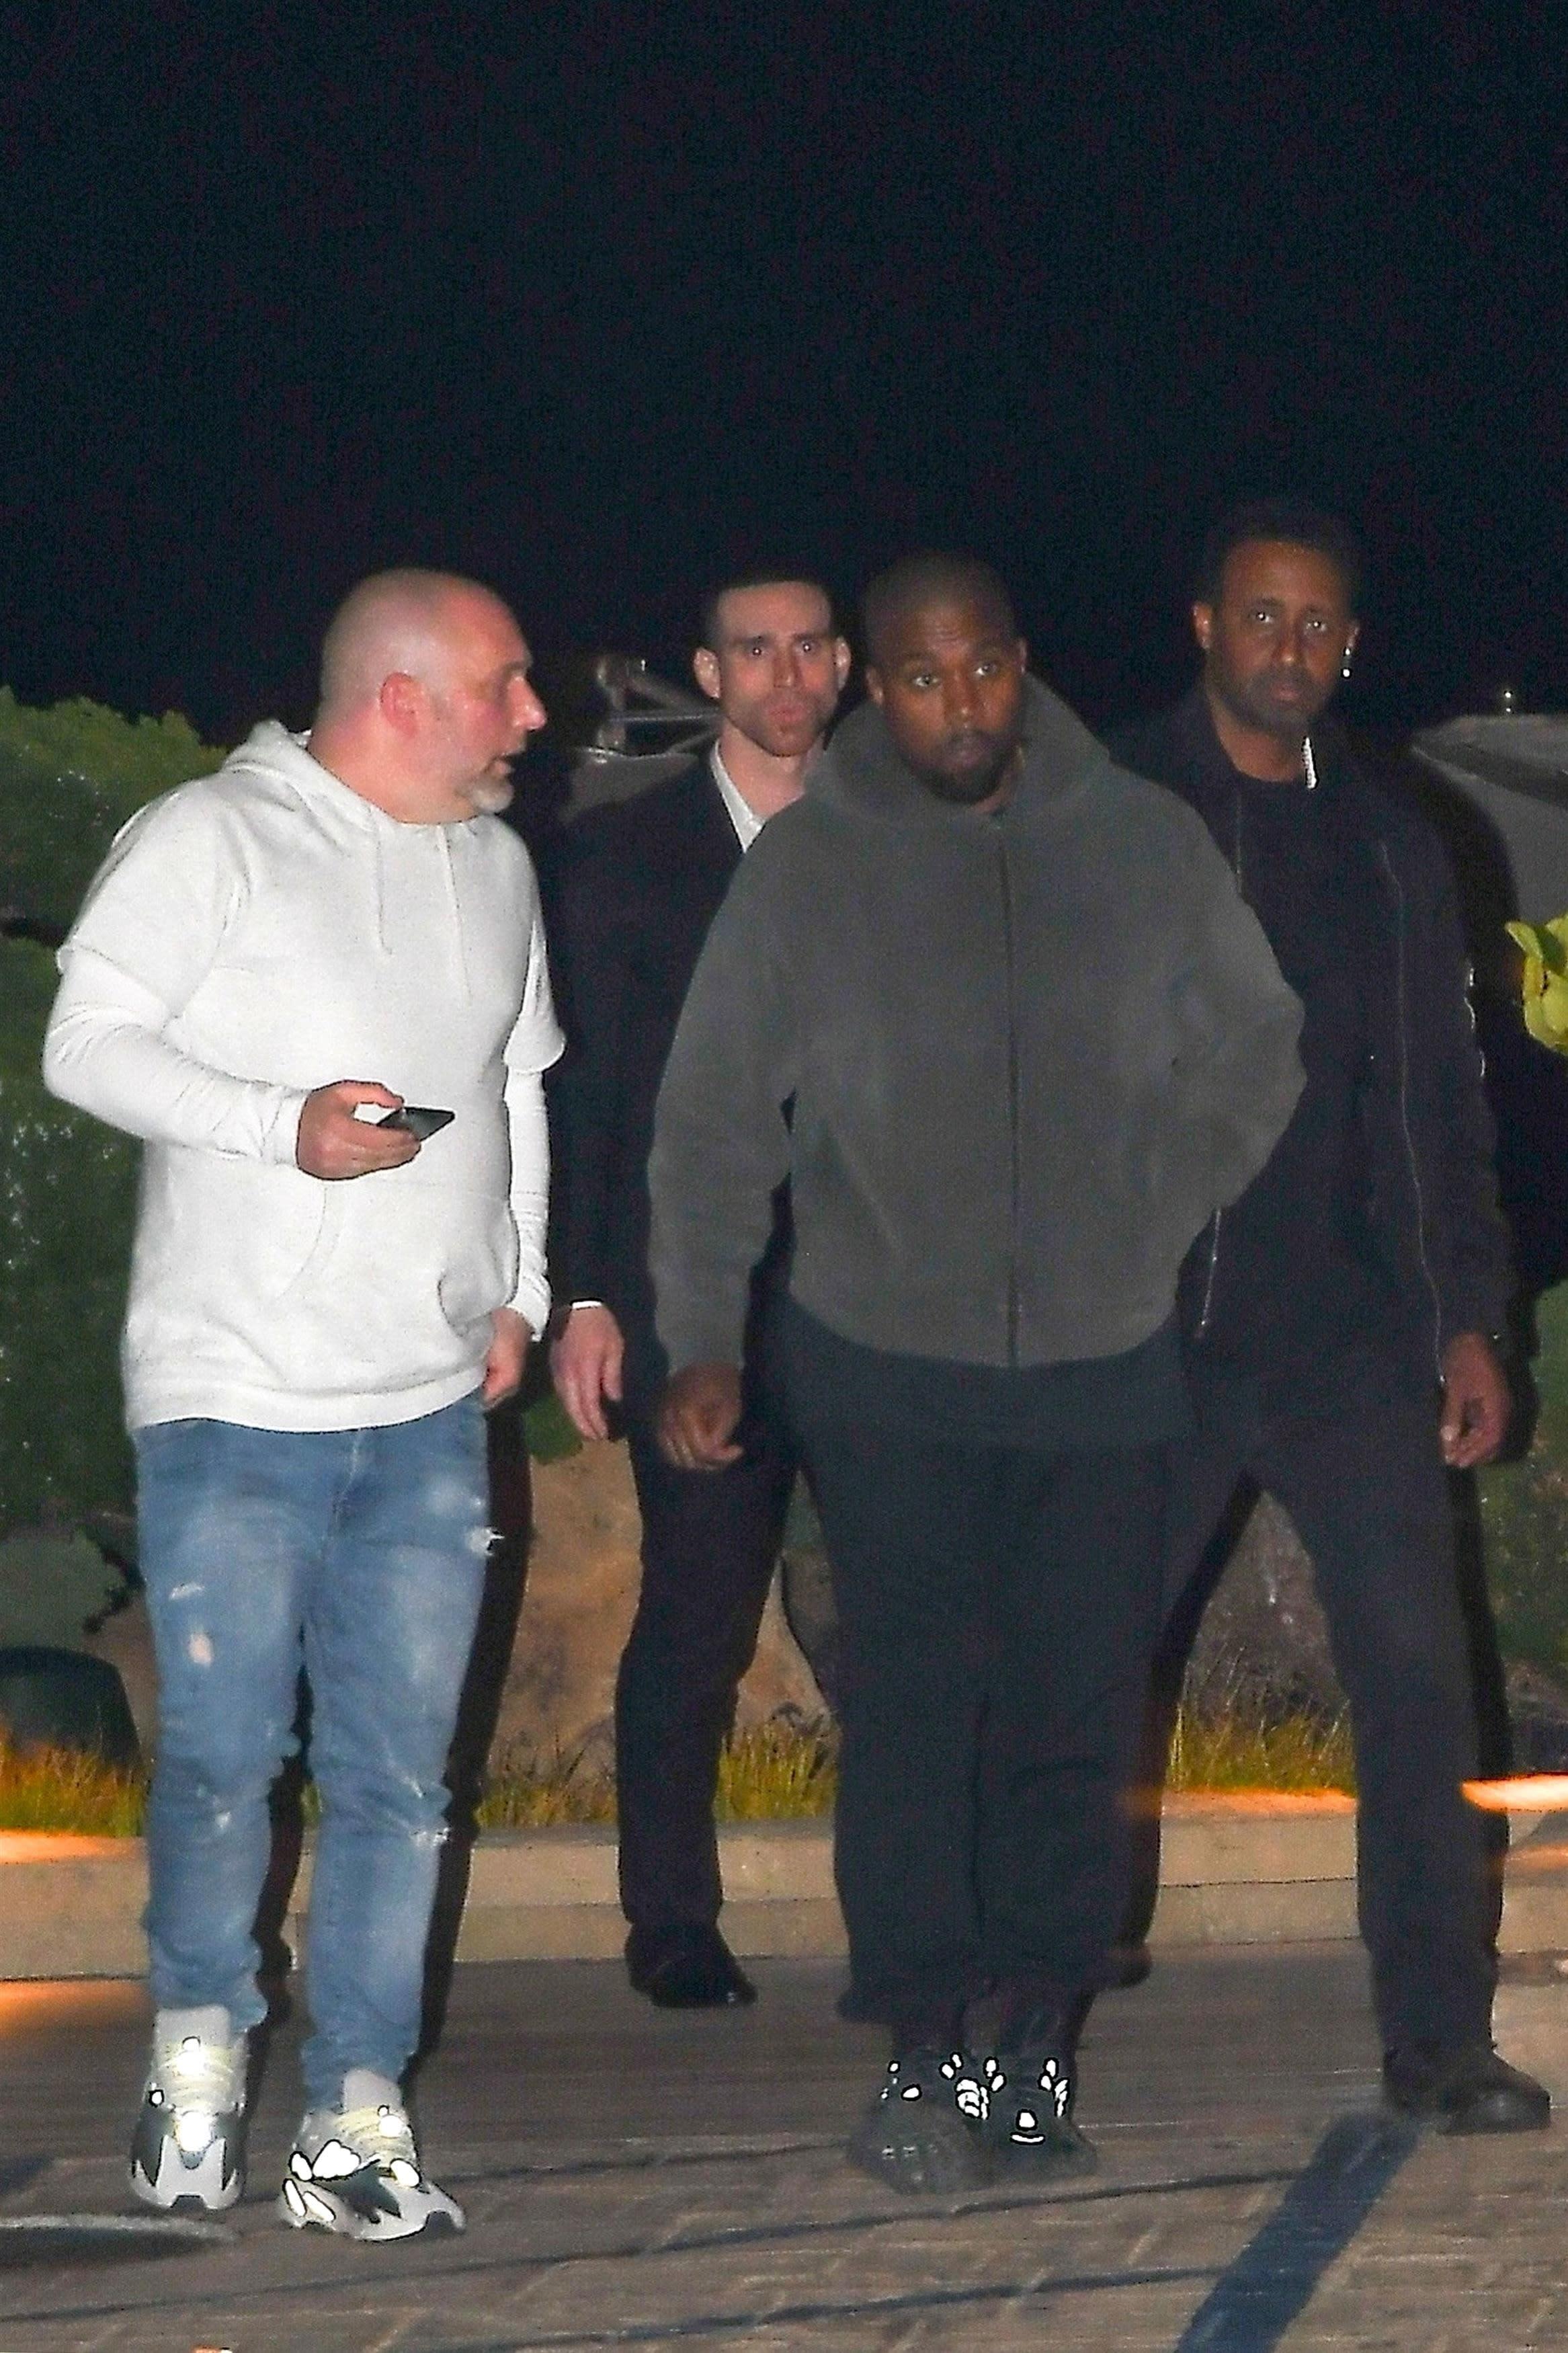 Did Kanye West's Trump tweets make him a Crips target? [Video]